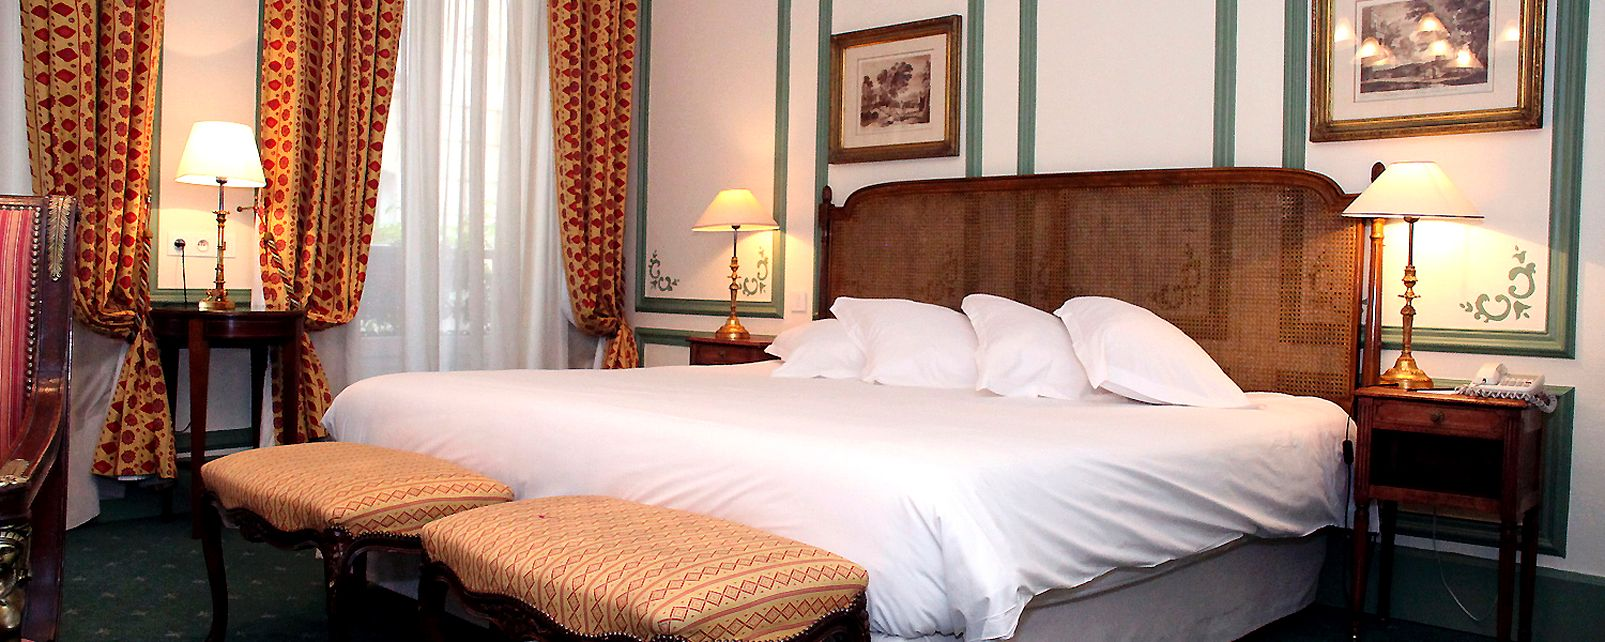 Hotel New Roblin Paris